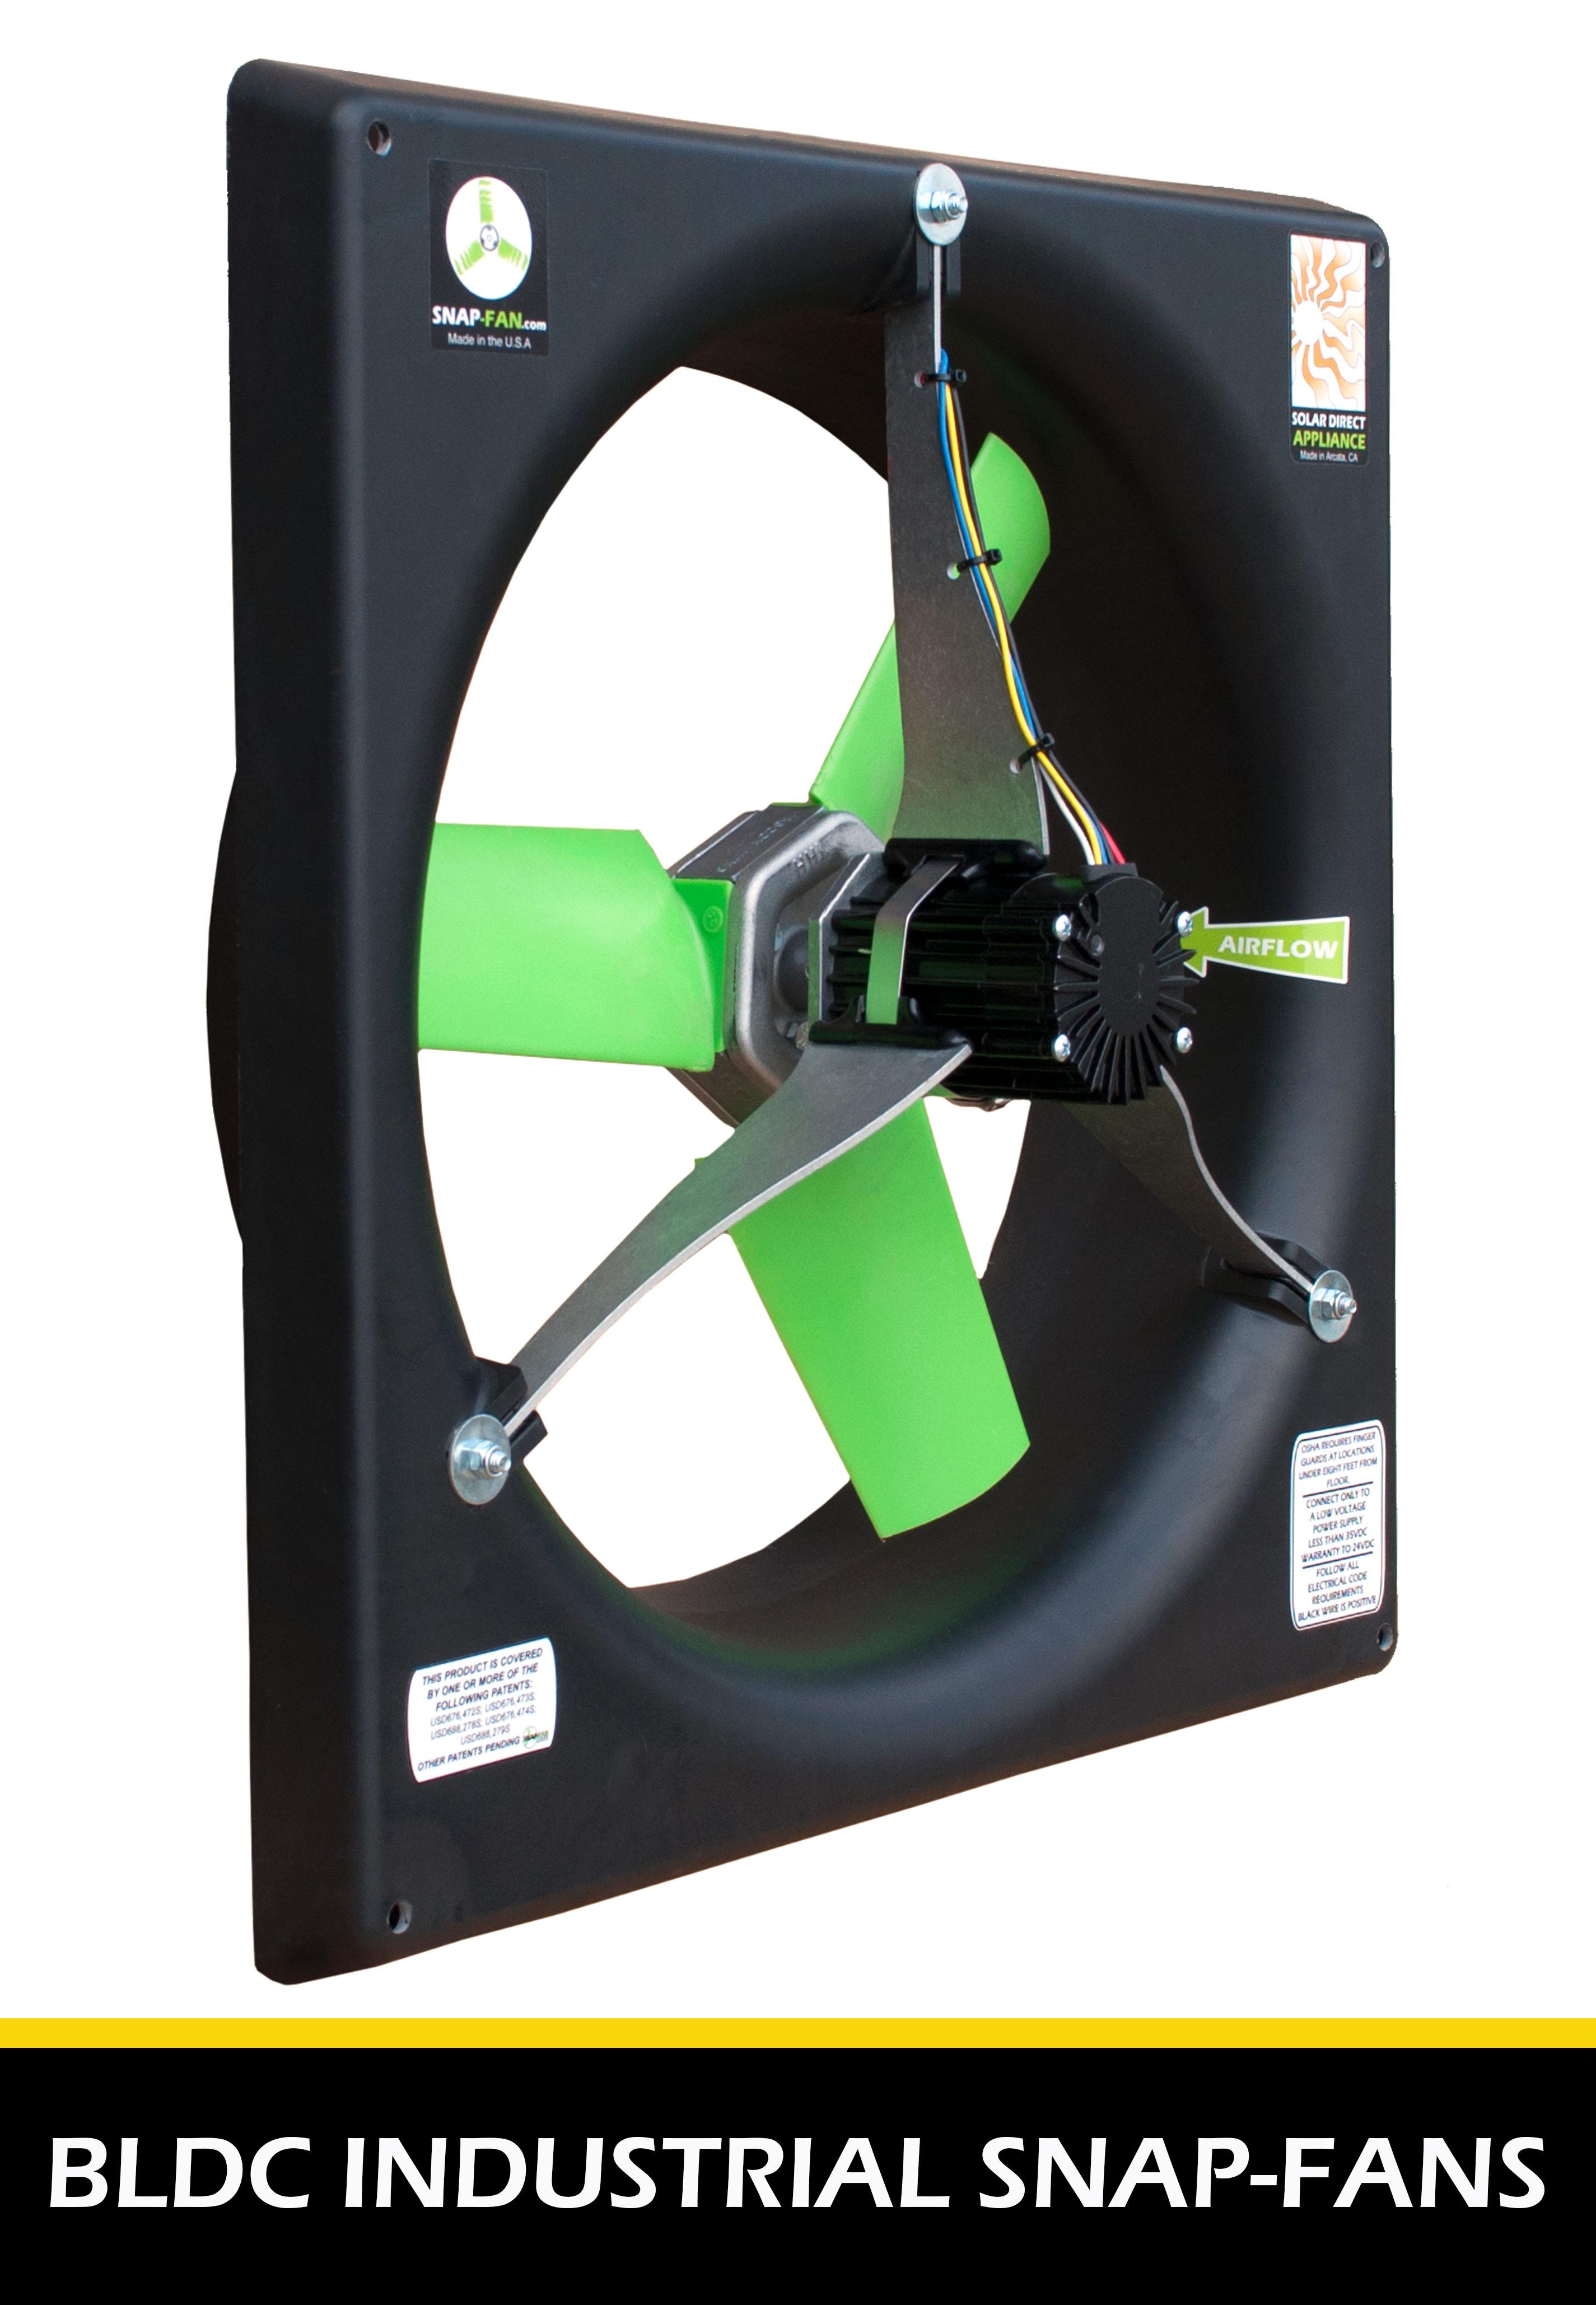 Industrial BLDC battery ventilation fans